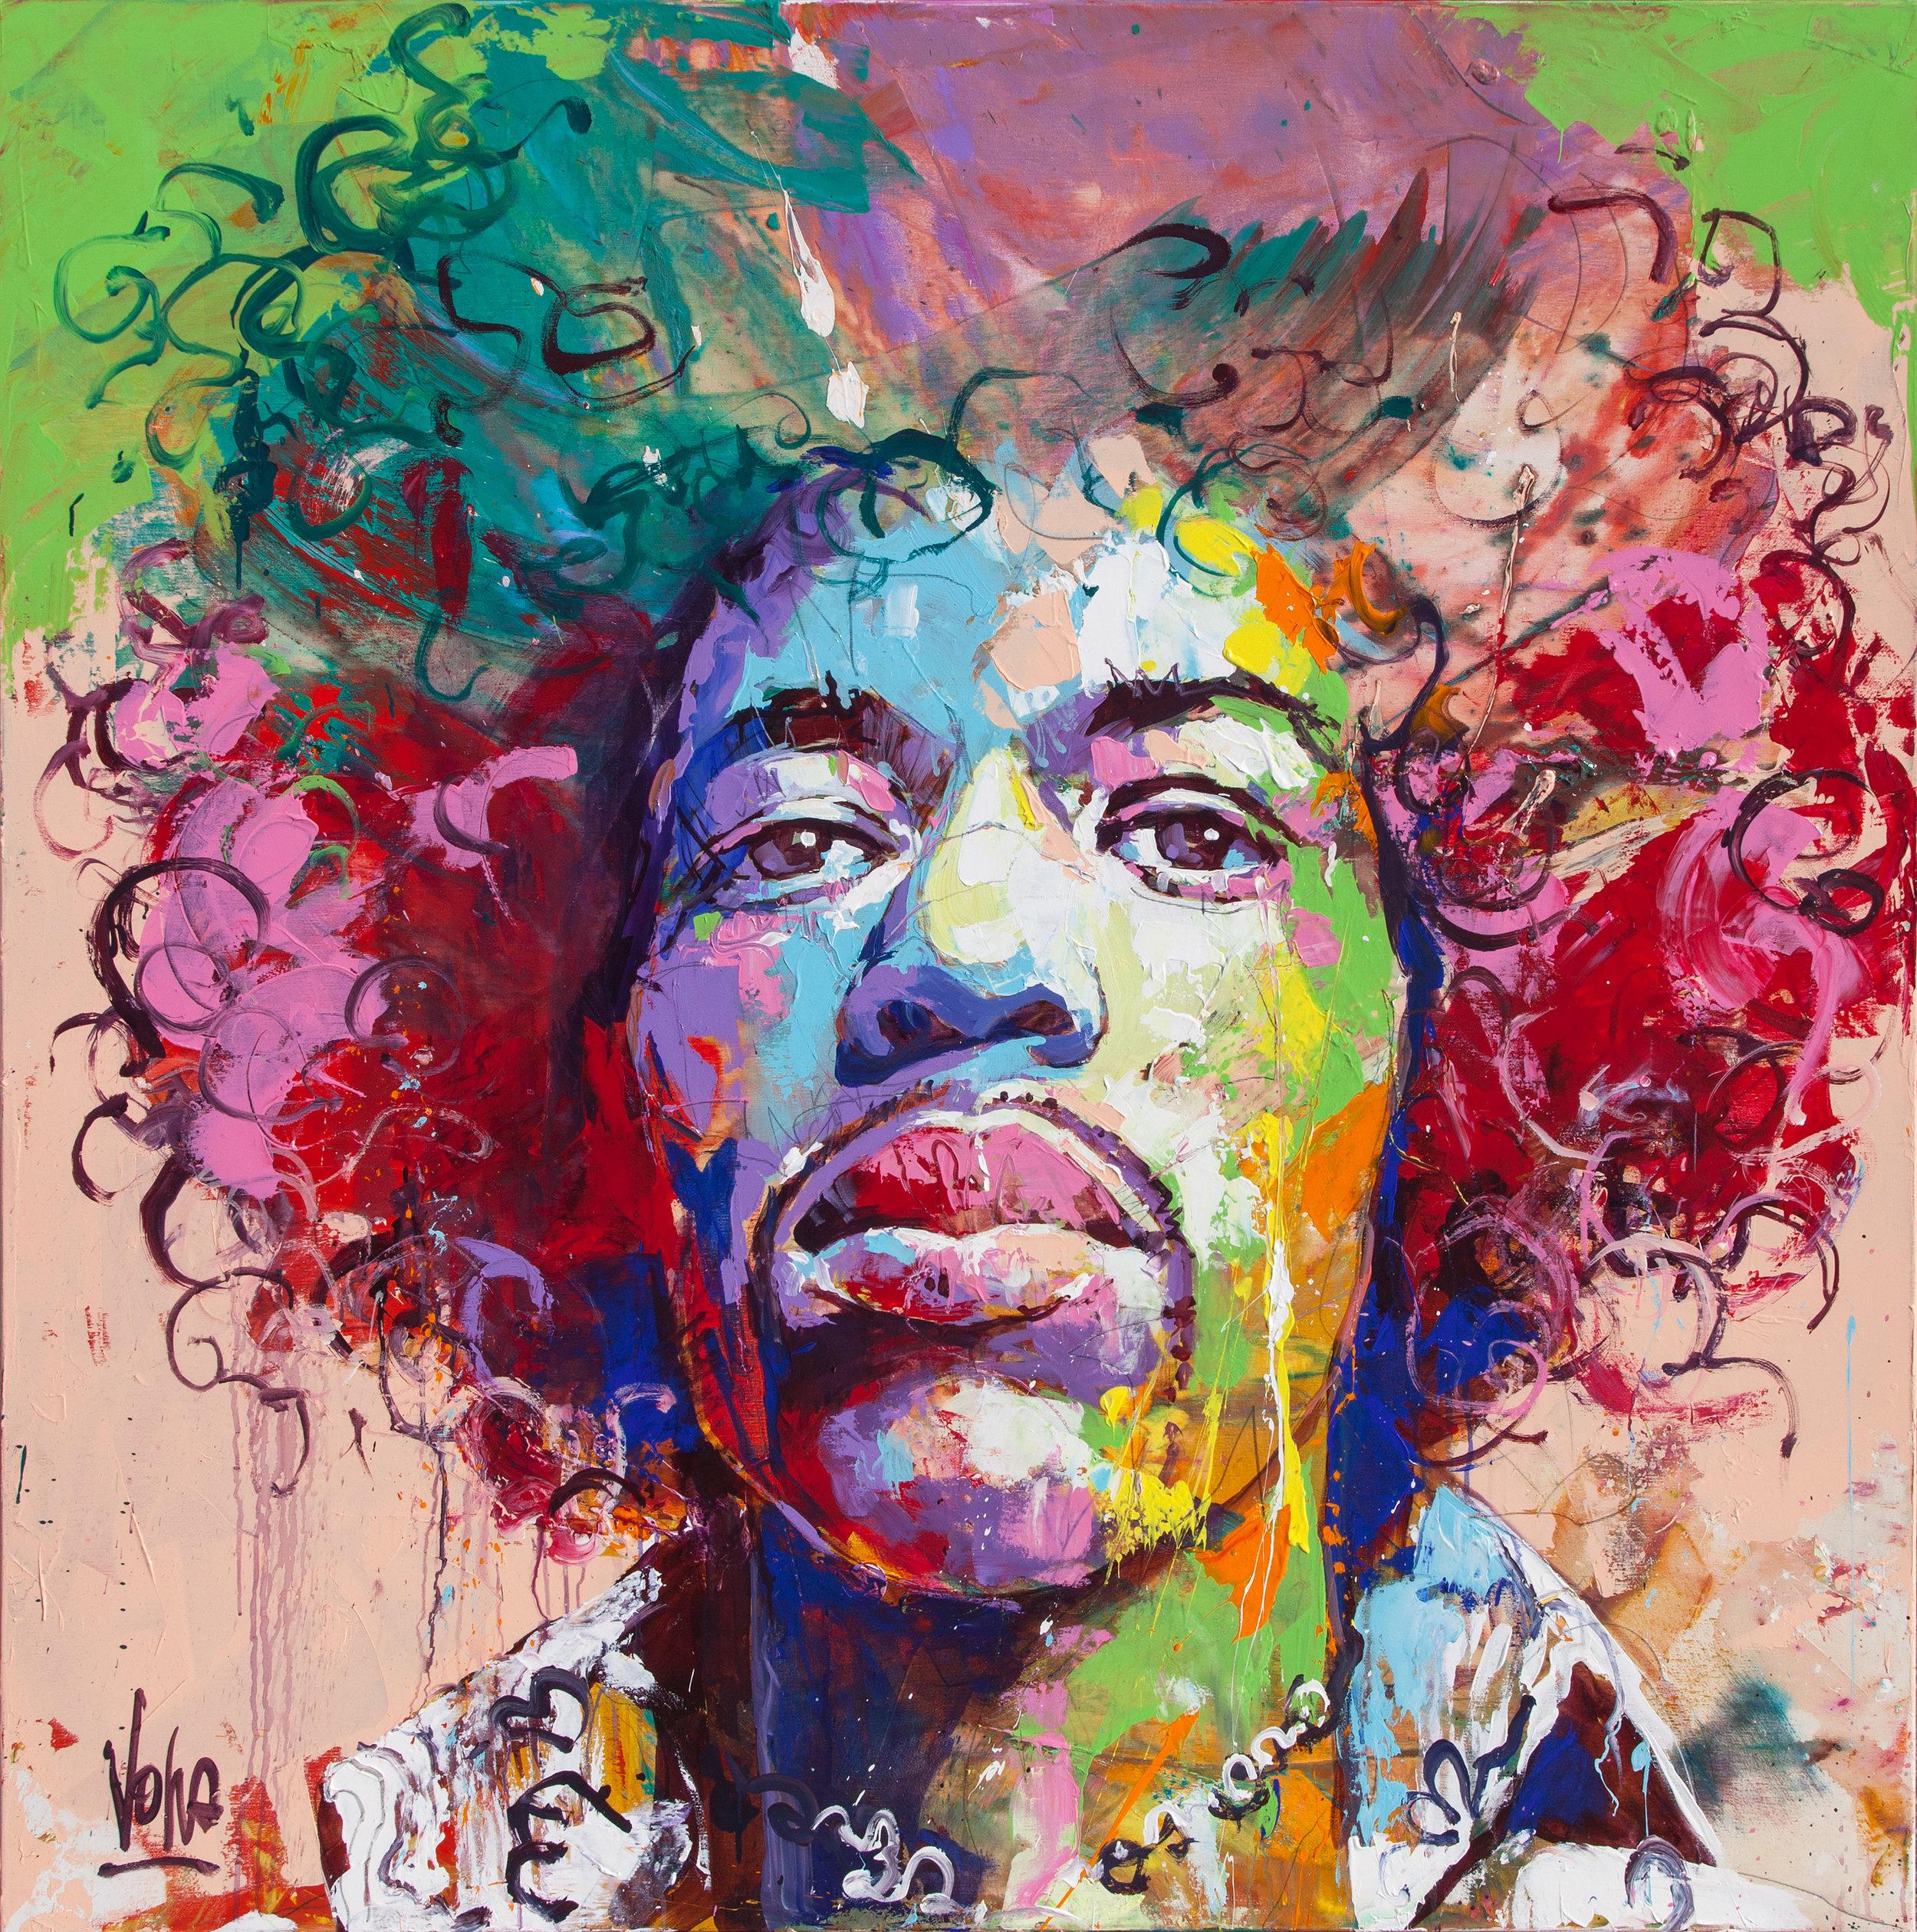 Jimi, 150x150 cm/59,1x59,1 inch, Acrylic on Canvas